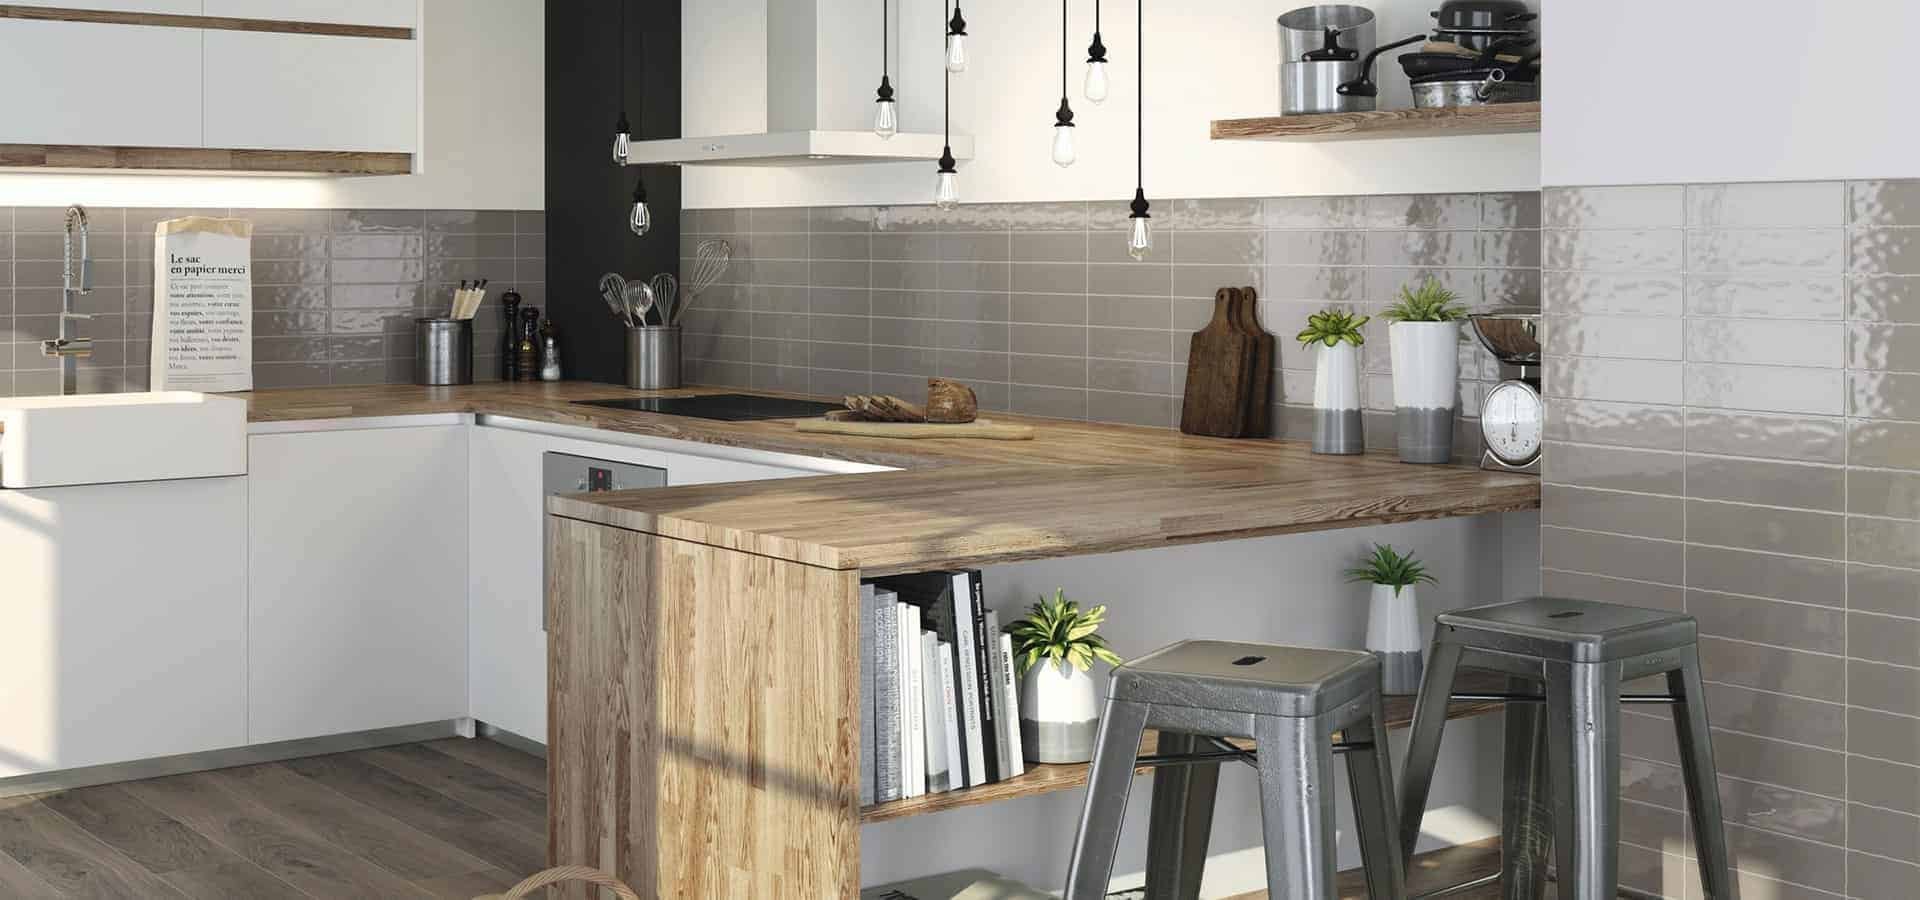 High Gloss, PVC, Solid Wood Kitchens